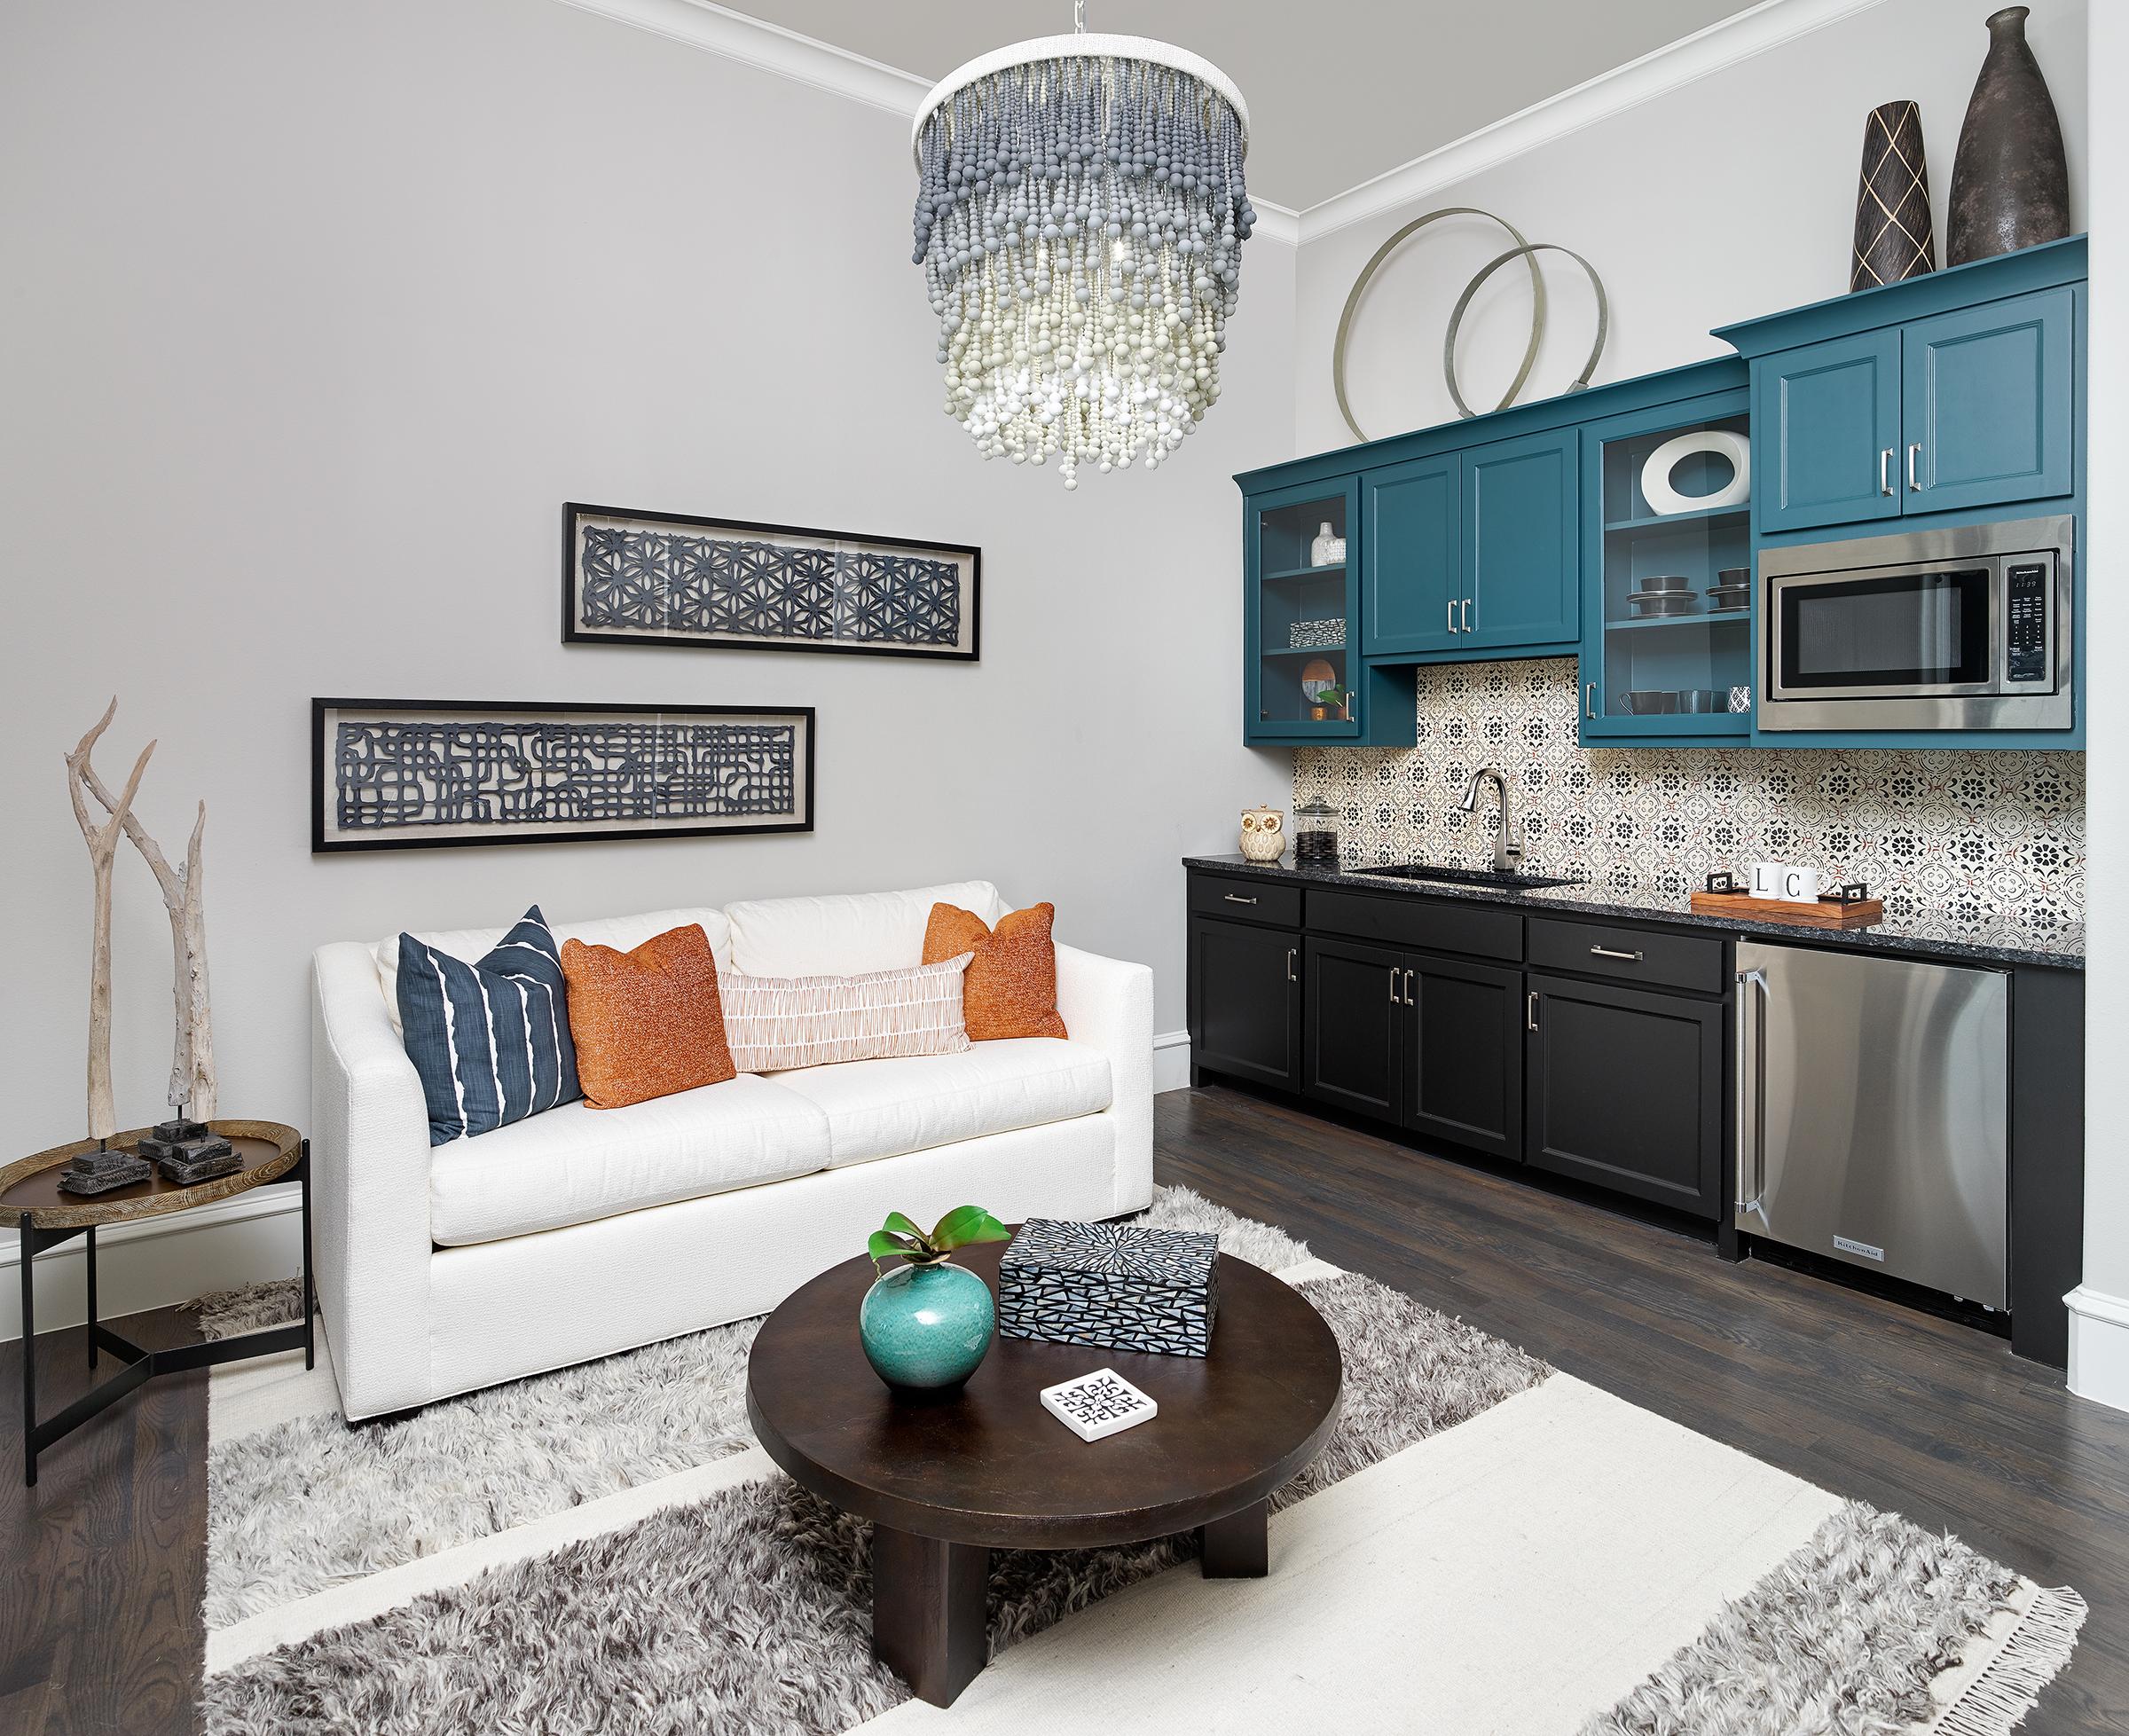 Stephanie Kratz Interiors design of Casita Remodel